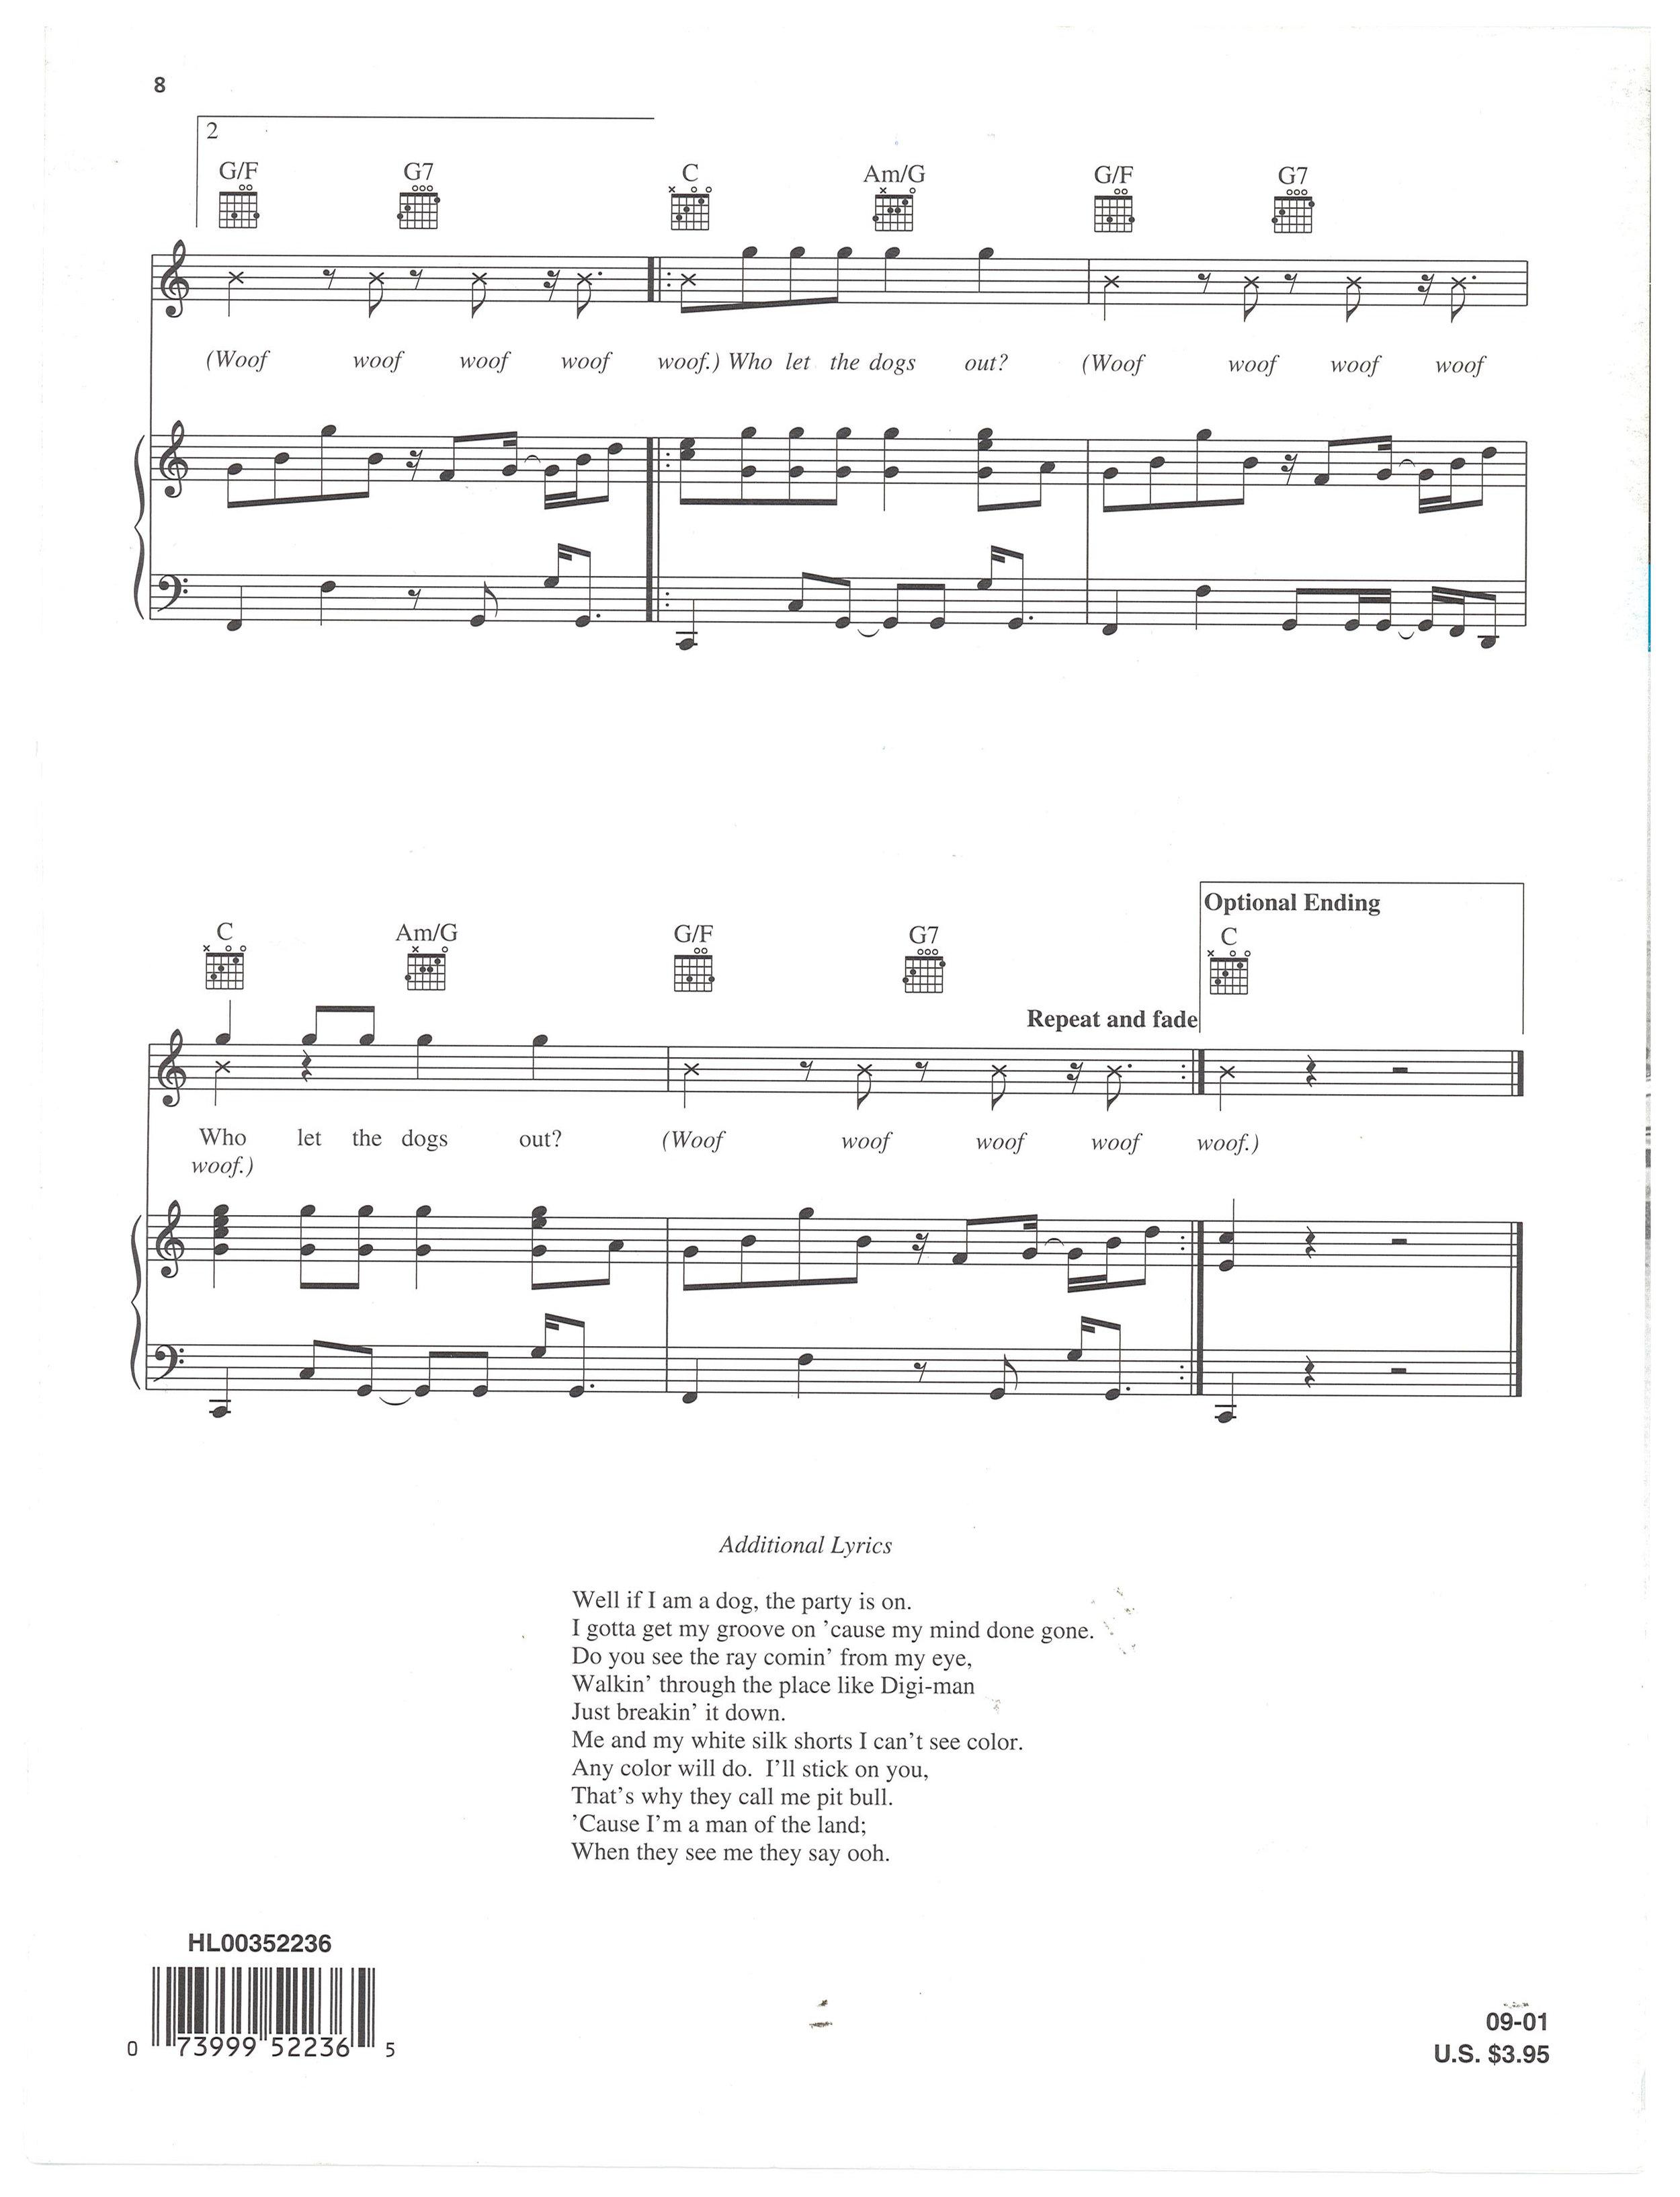 WLWLTDOO-2000-BAHAMEN-SONGBOOK-SINGLE-BACK.jpg